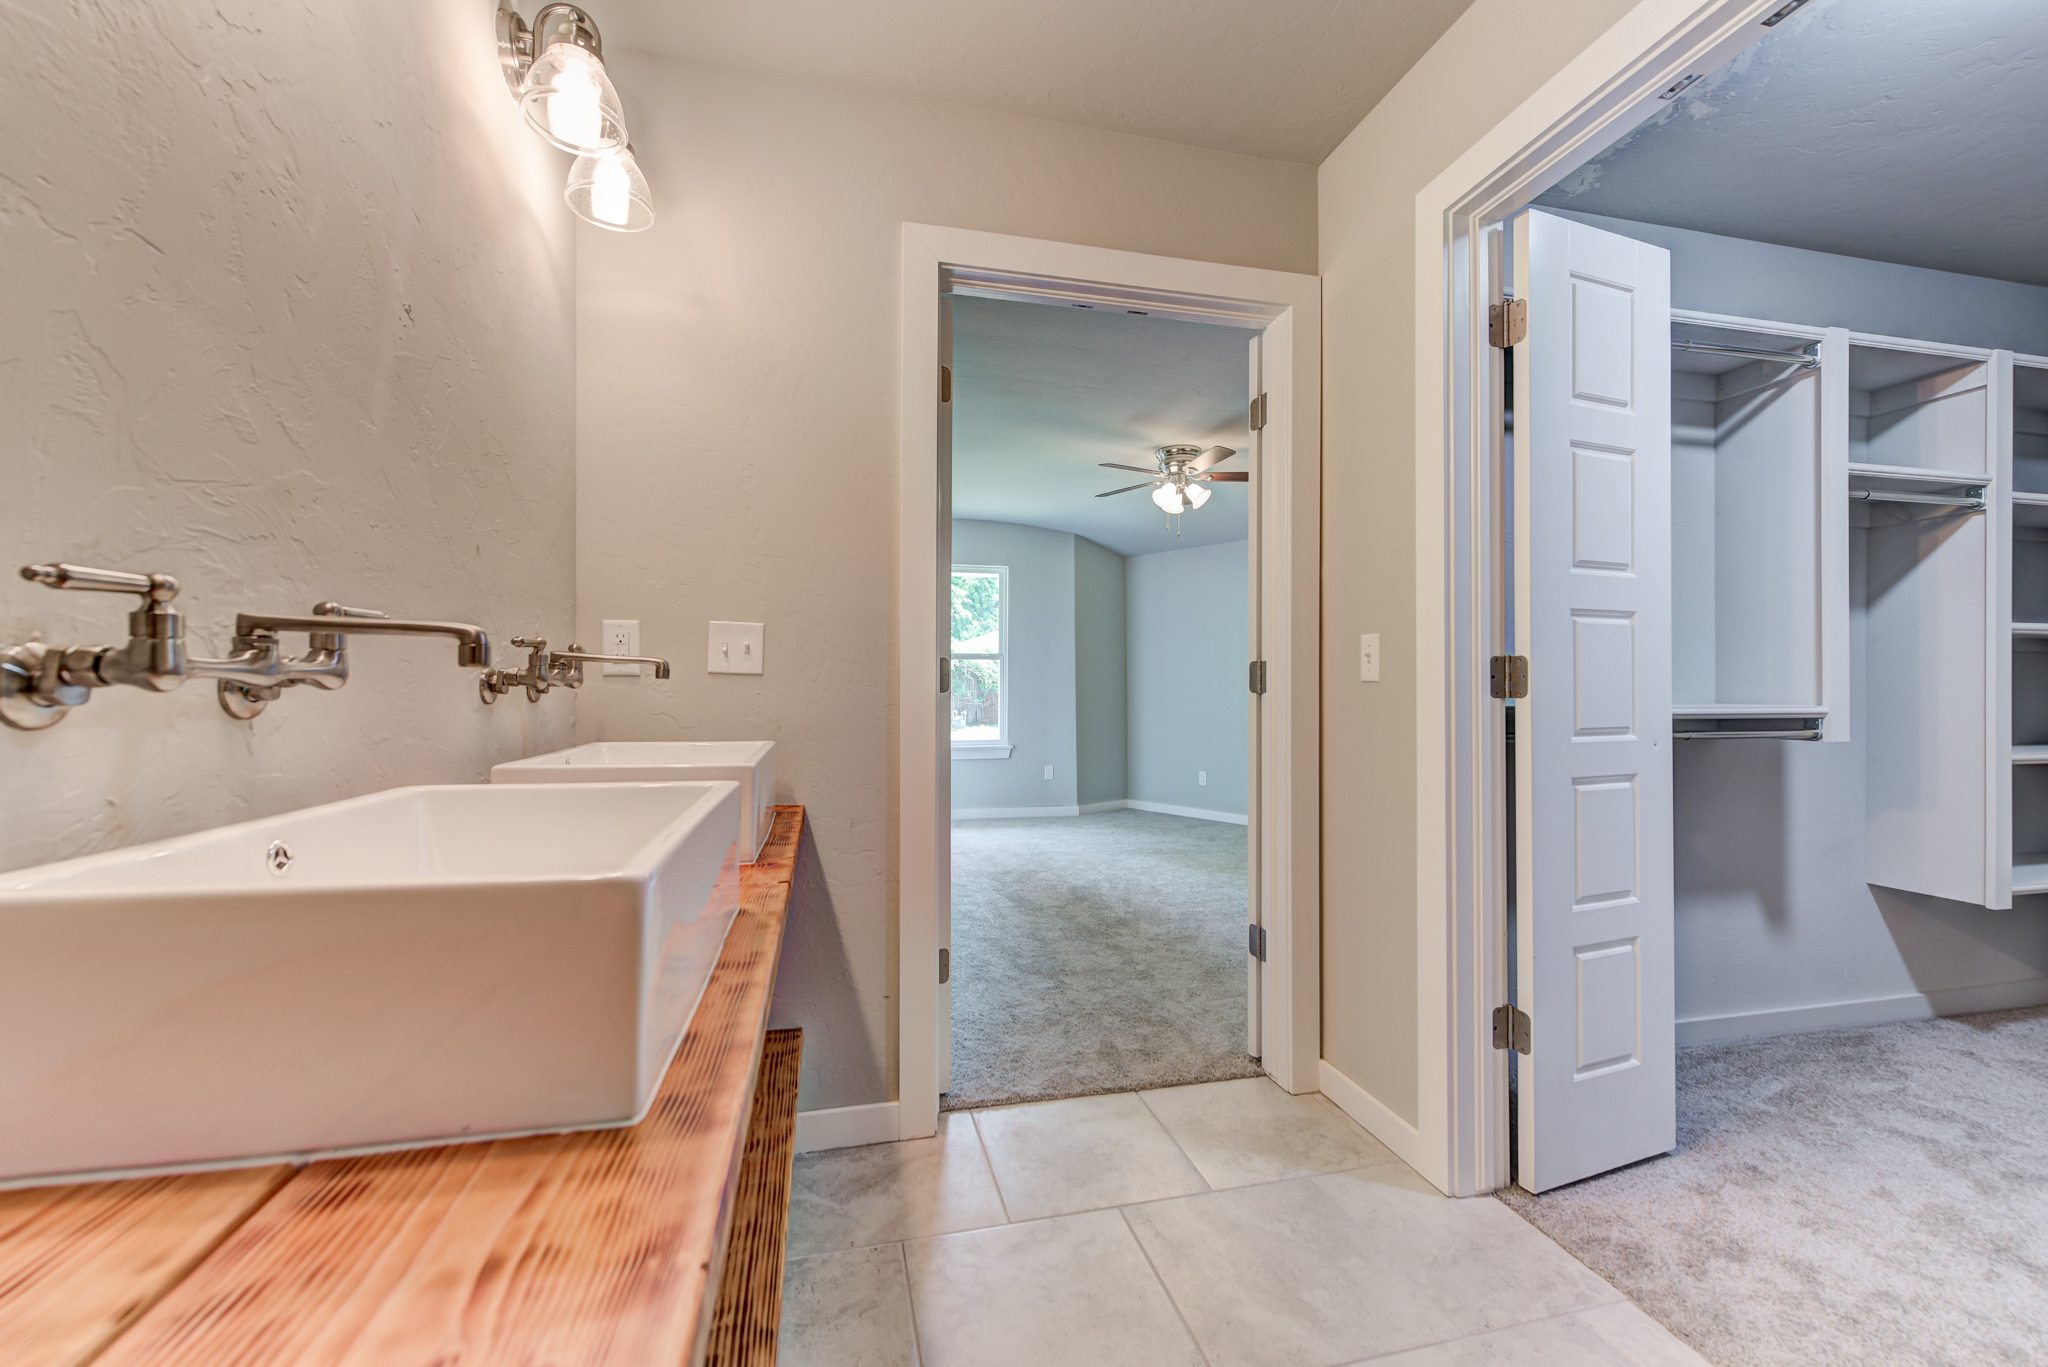 Updated master bathroom and closet